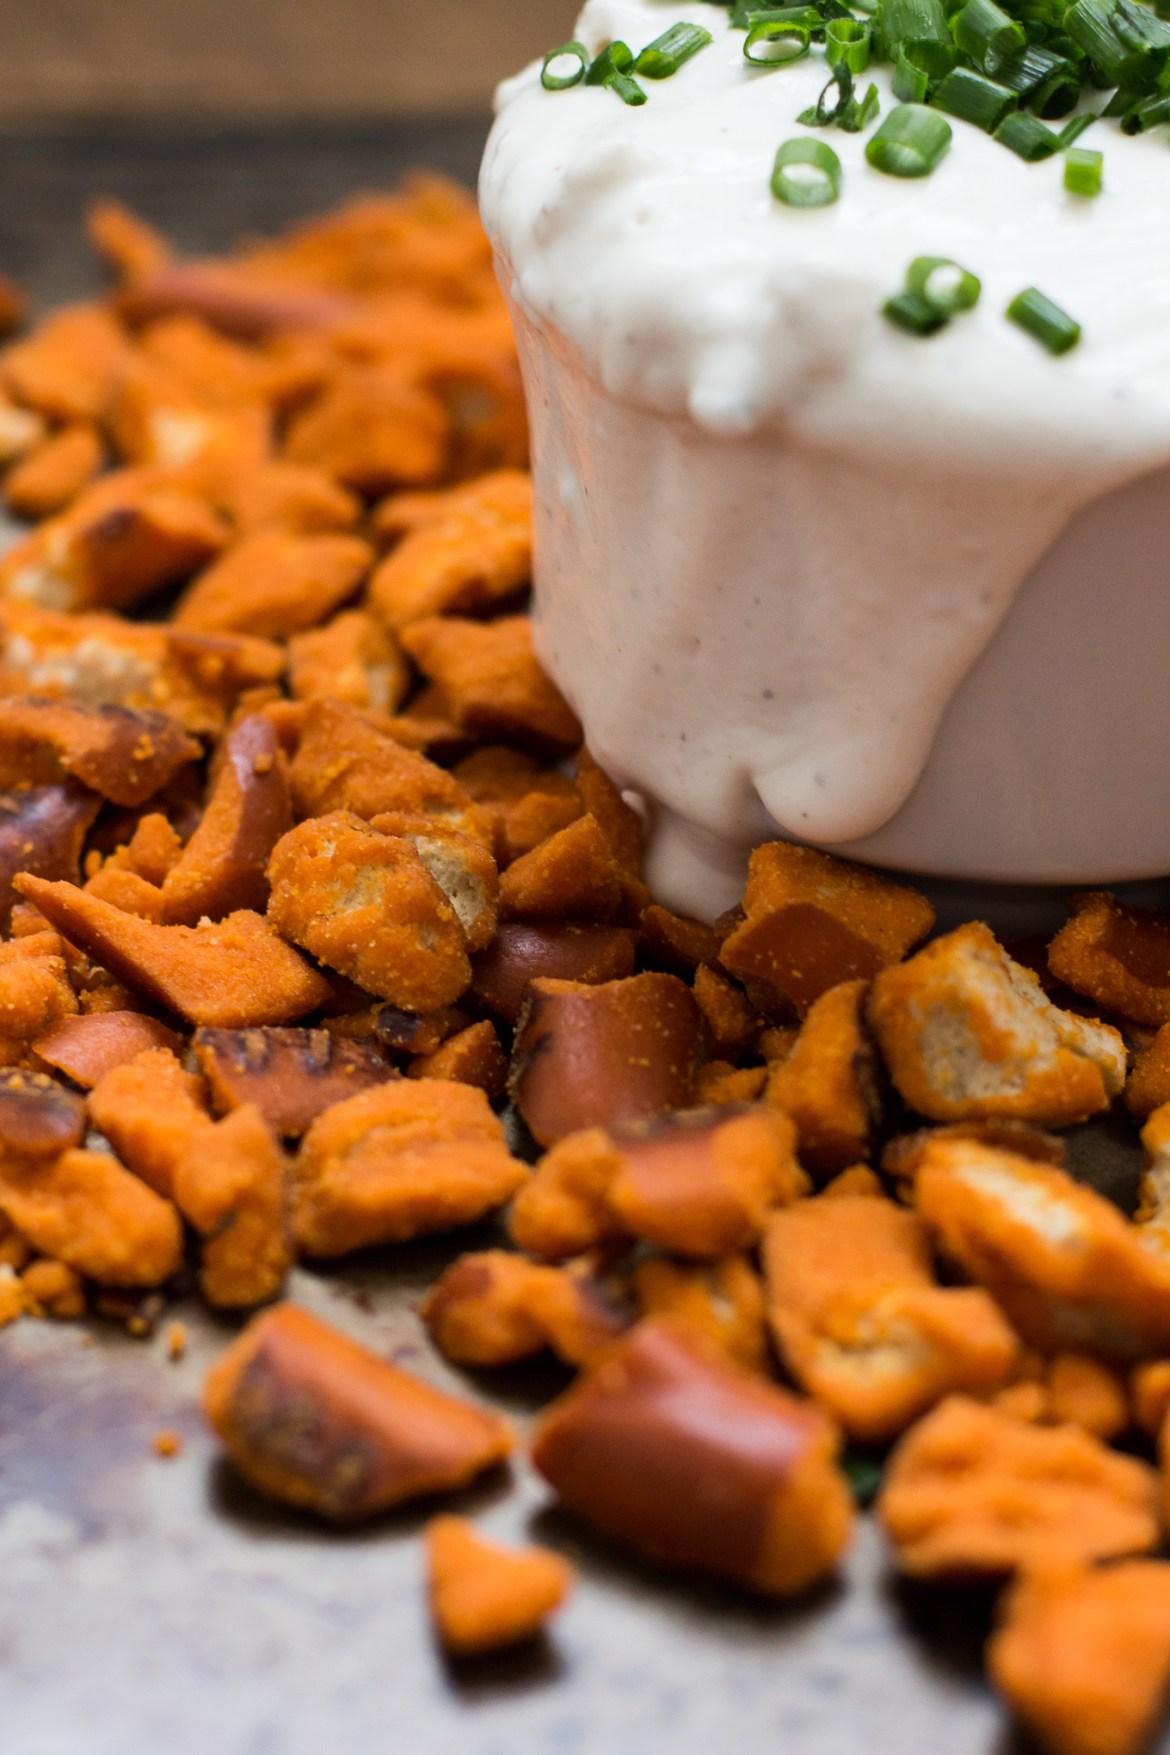 bleu cheese dip, buffalo flavored pretzels, game day dips, snyders of hanover, greek yogurt dips